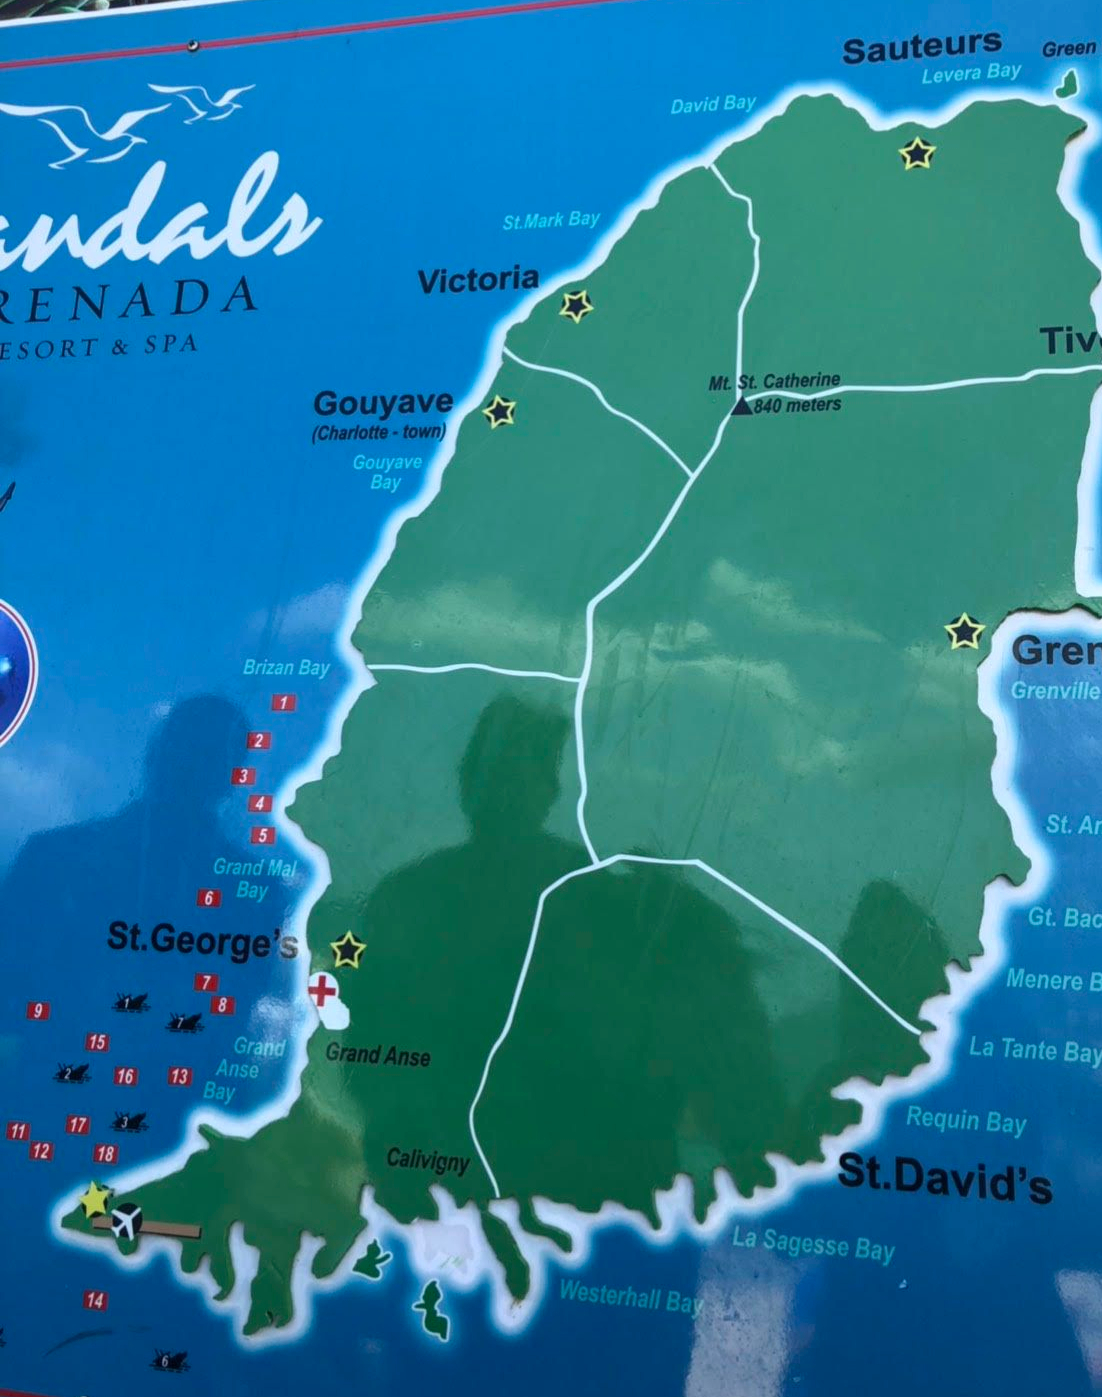 grenada-map.jpg